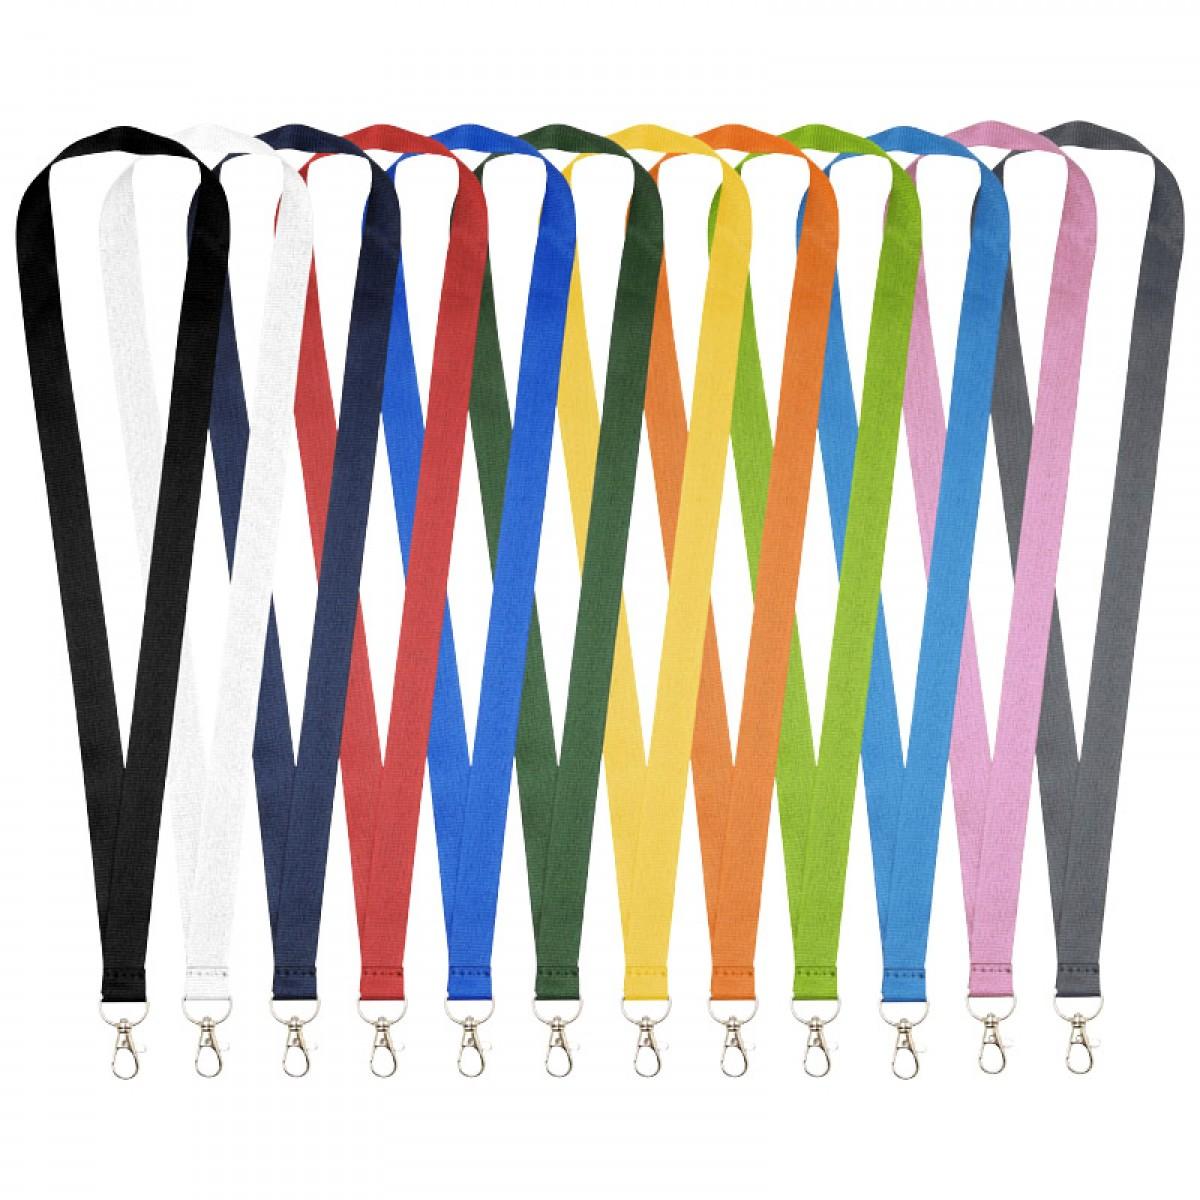 Nyckelband Color - Utan tryck